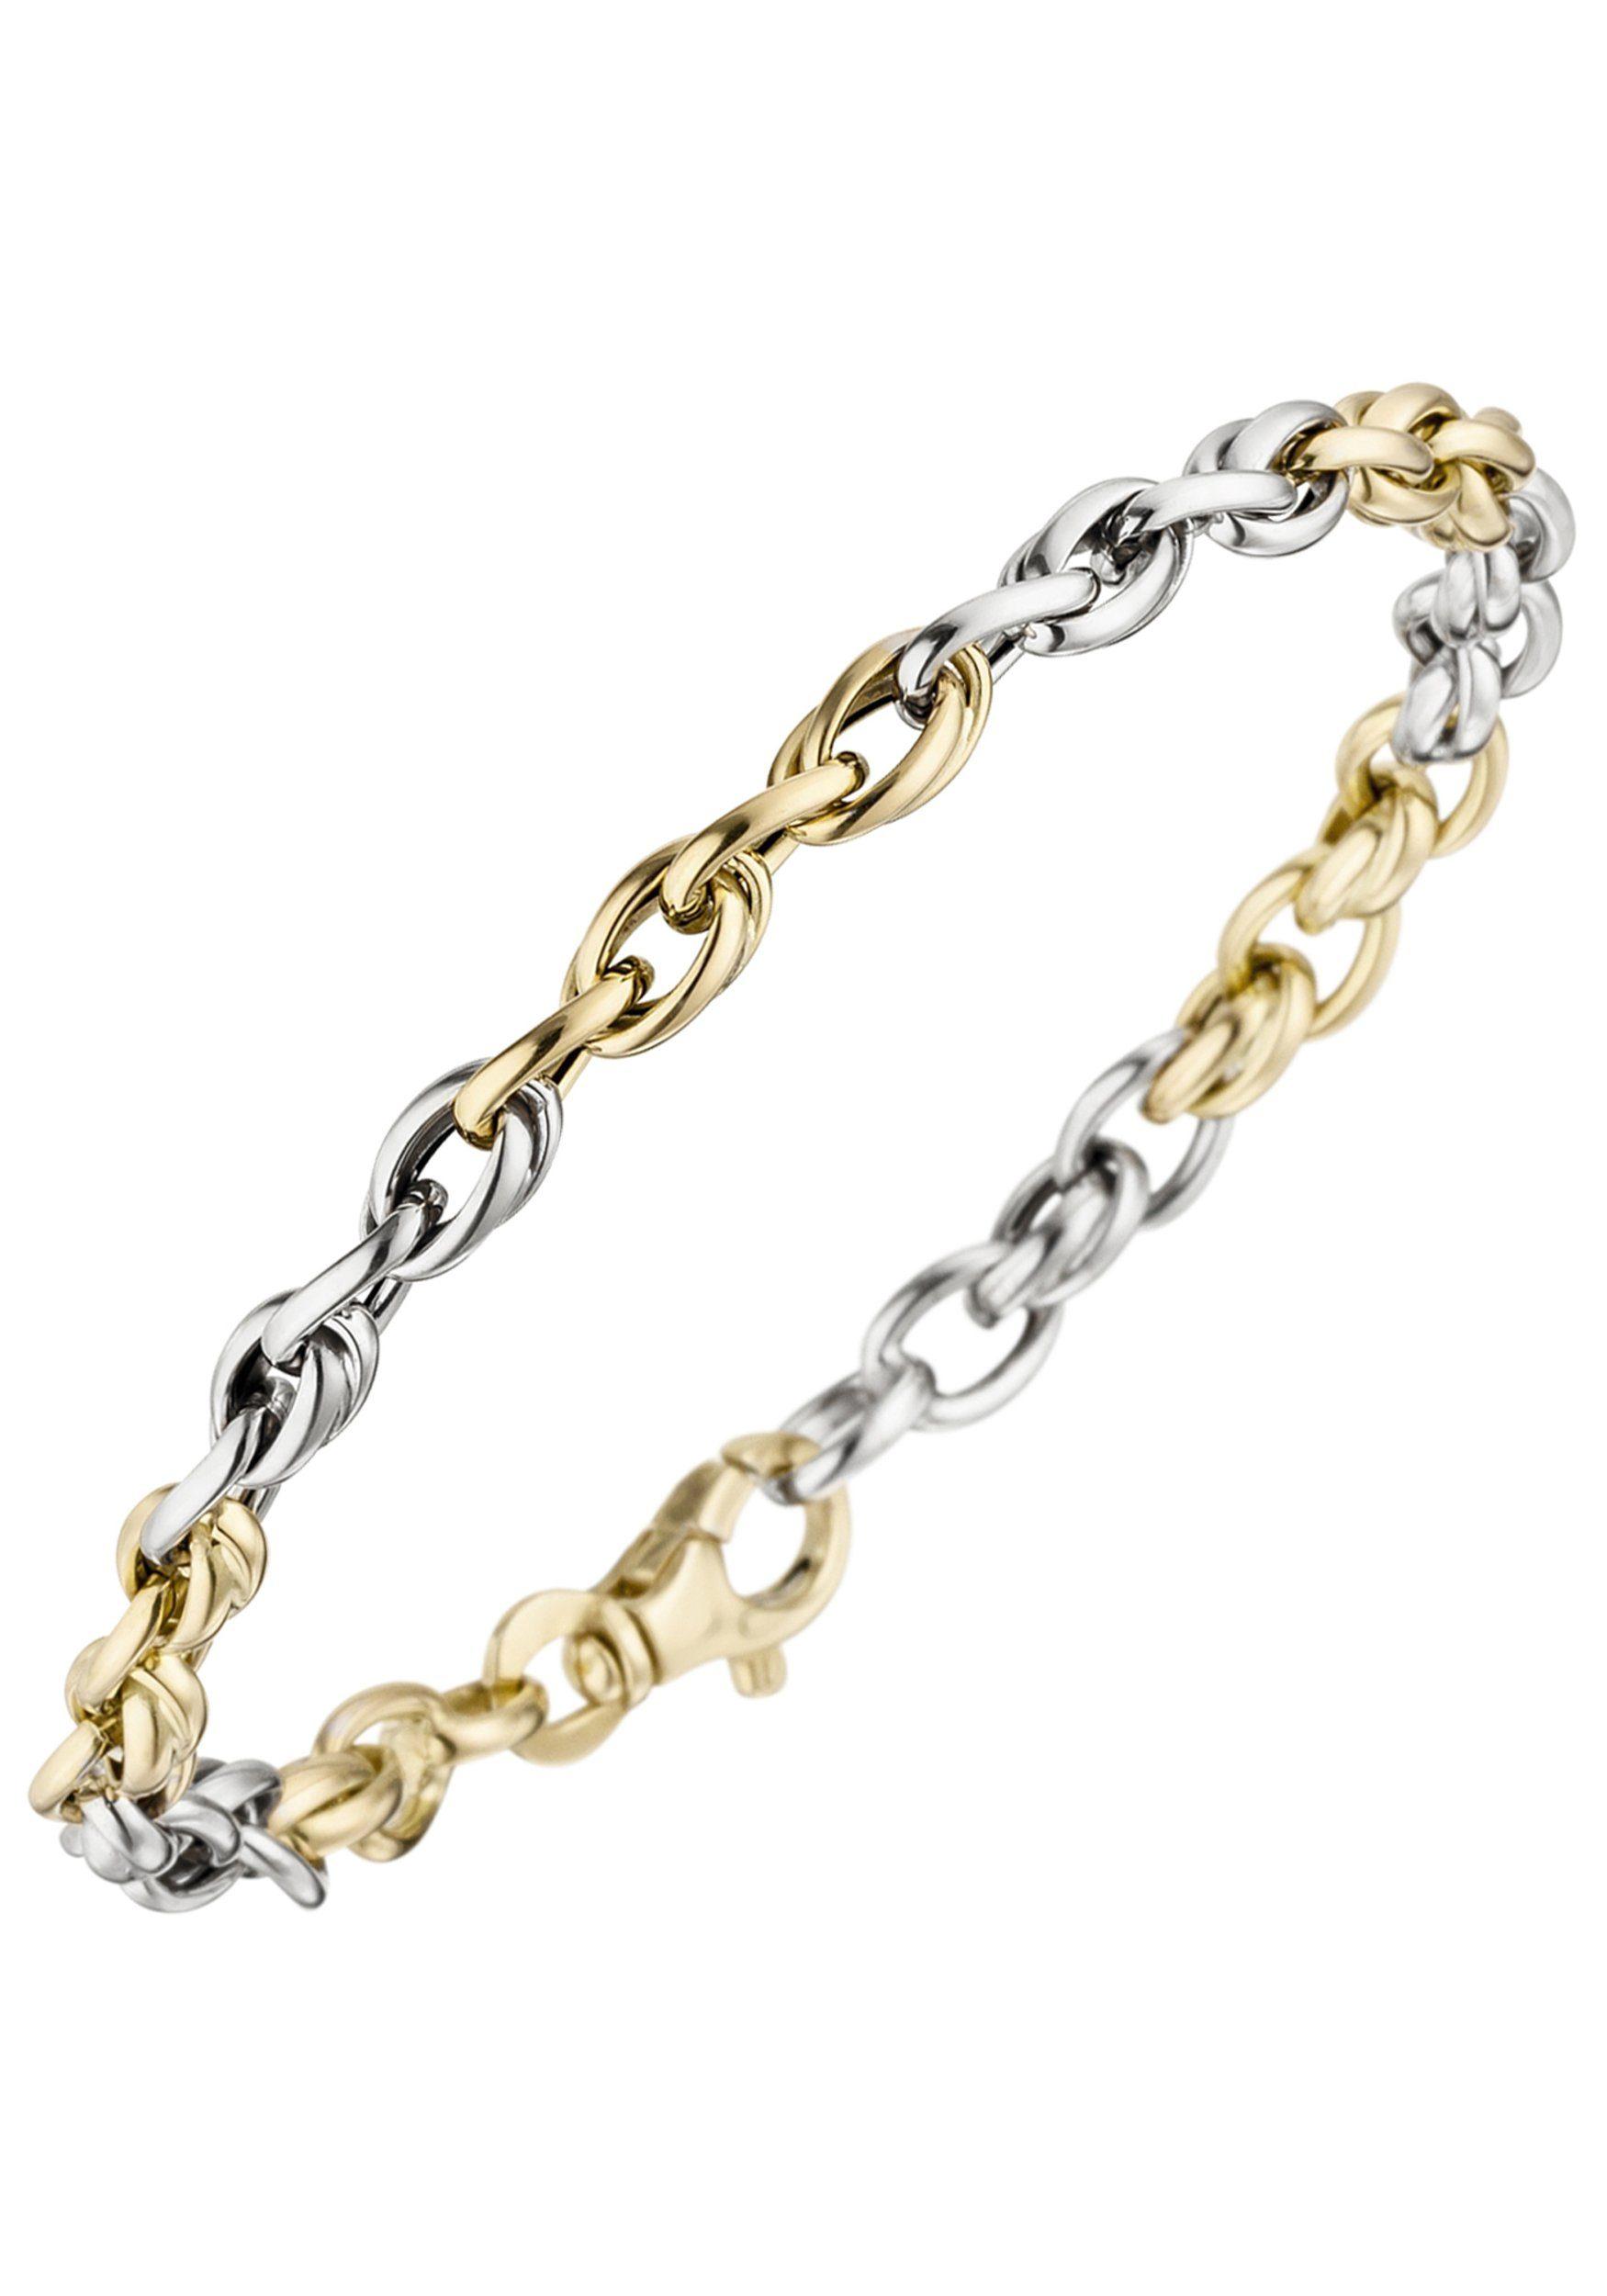 JOBO Goldarmband 585 Gold bicolor 19 cm